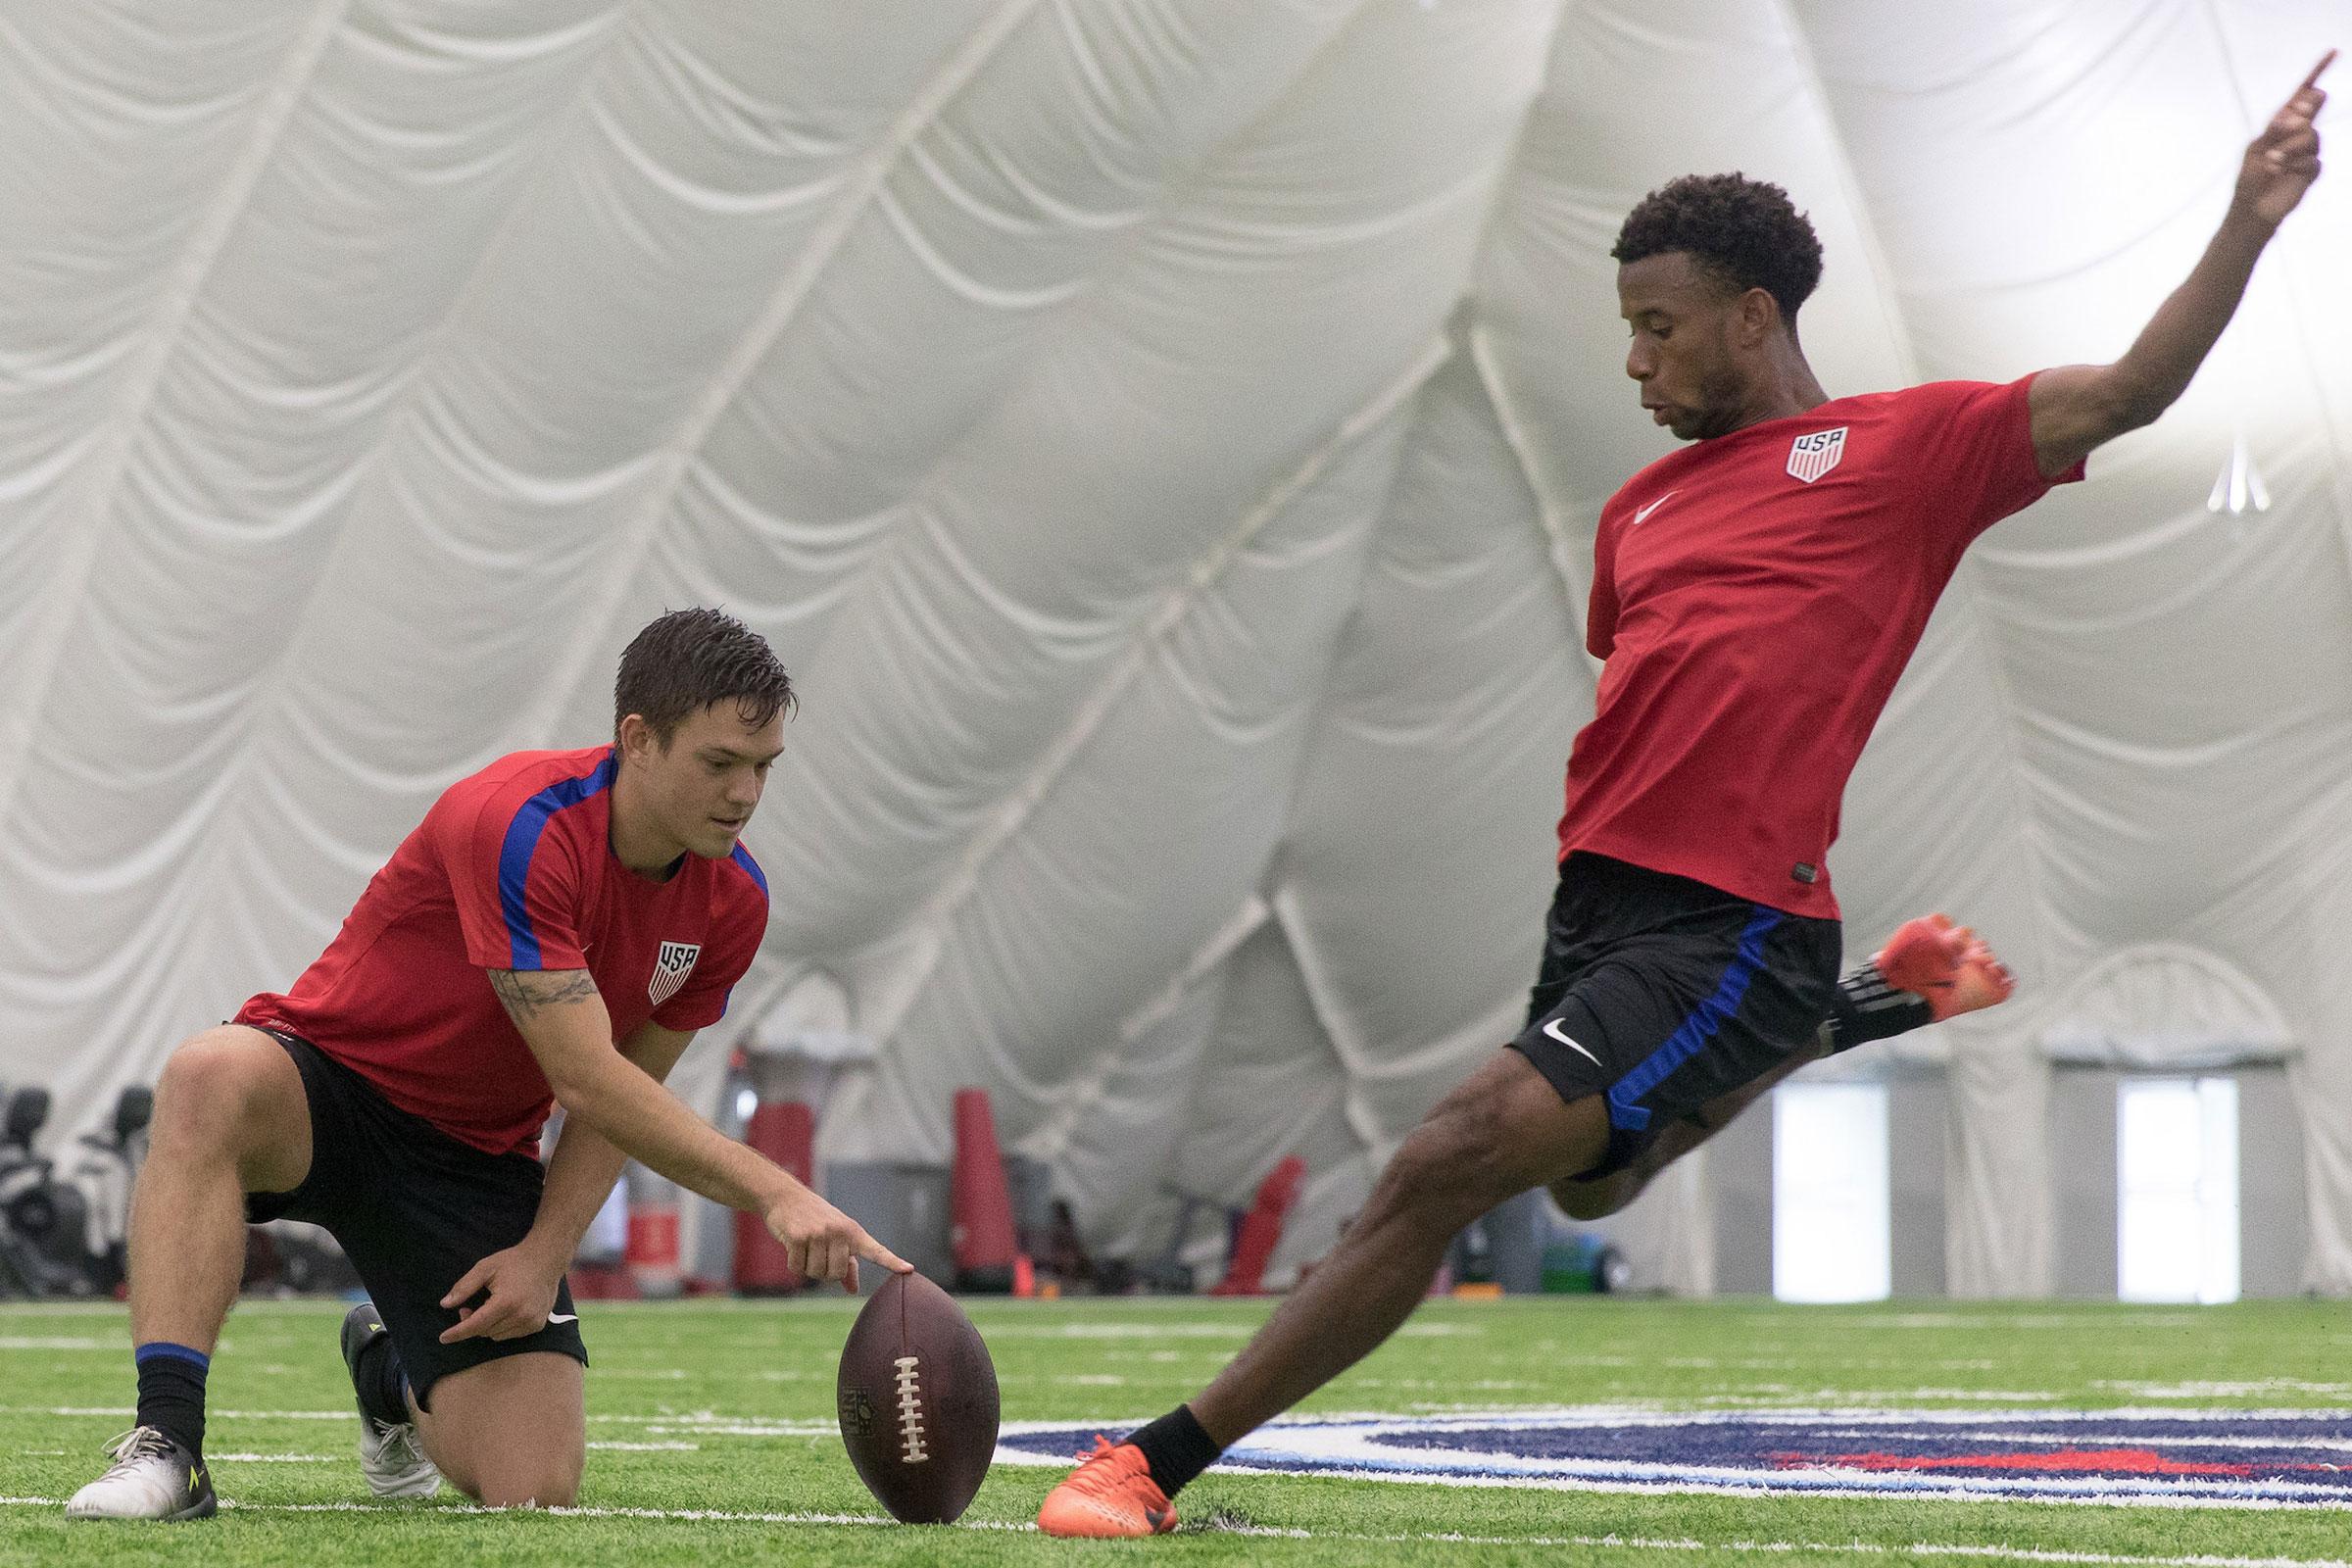 usmnt-football-kelyn-rowe-kellyn-acosta-training